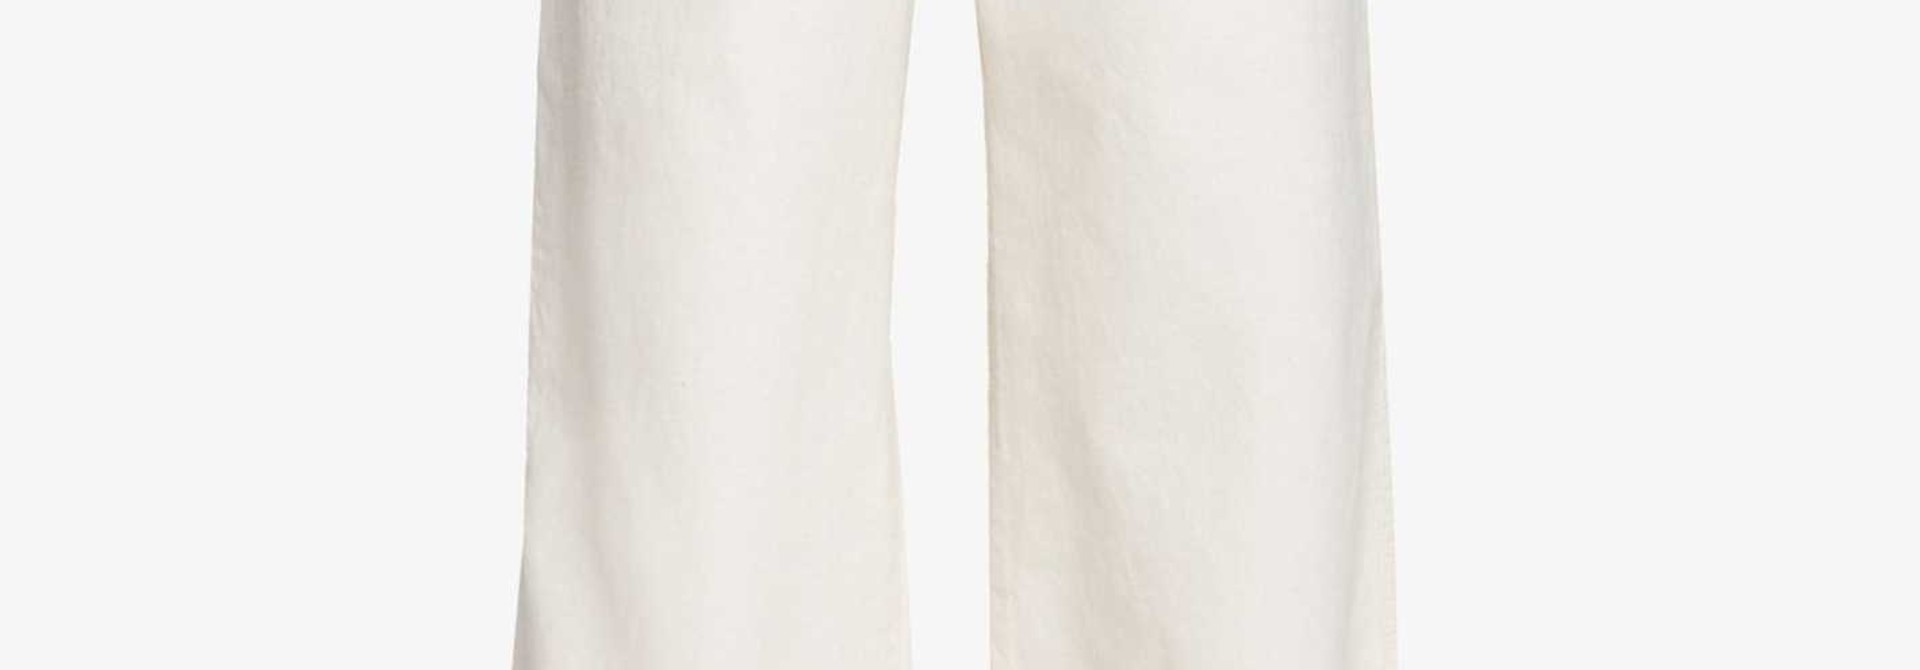 Collot trousers Samsoe Samsoe